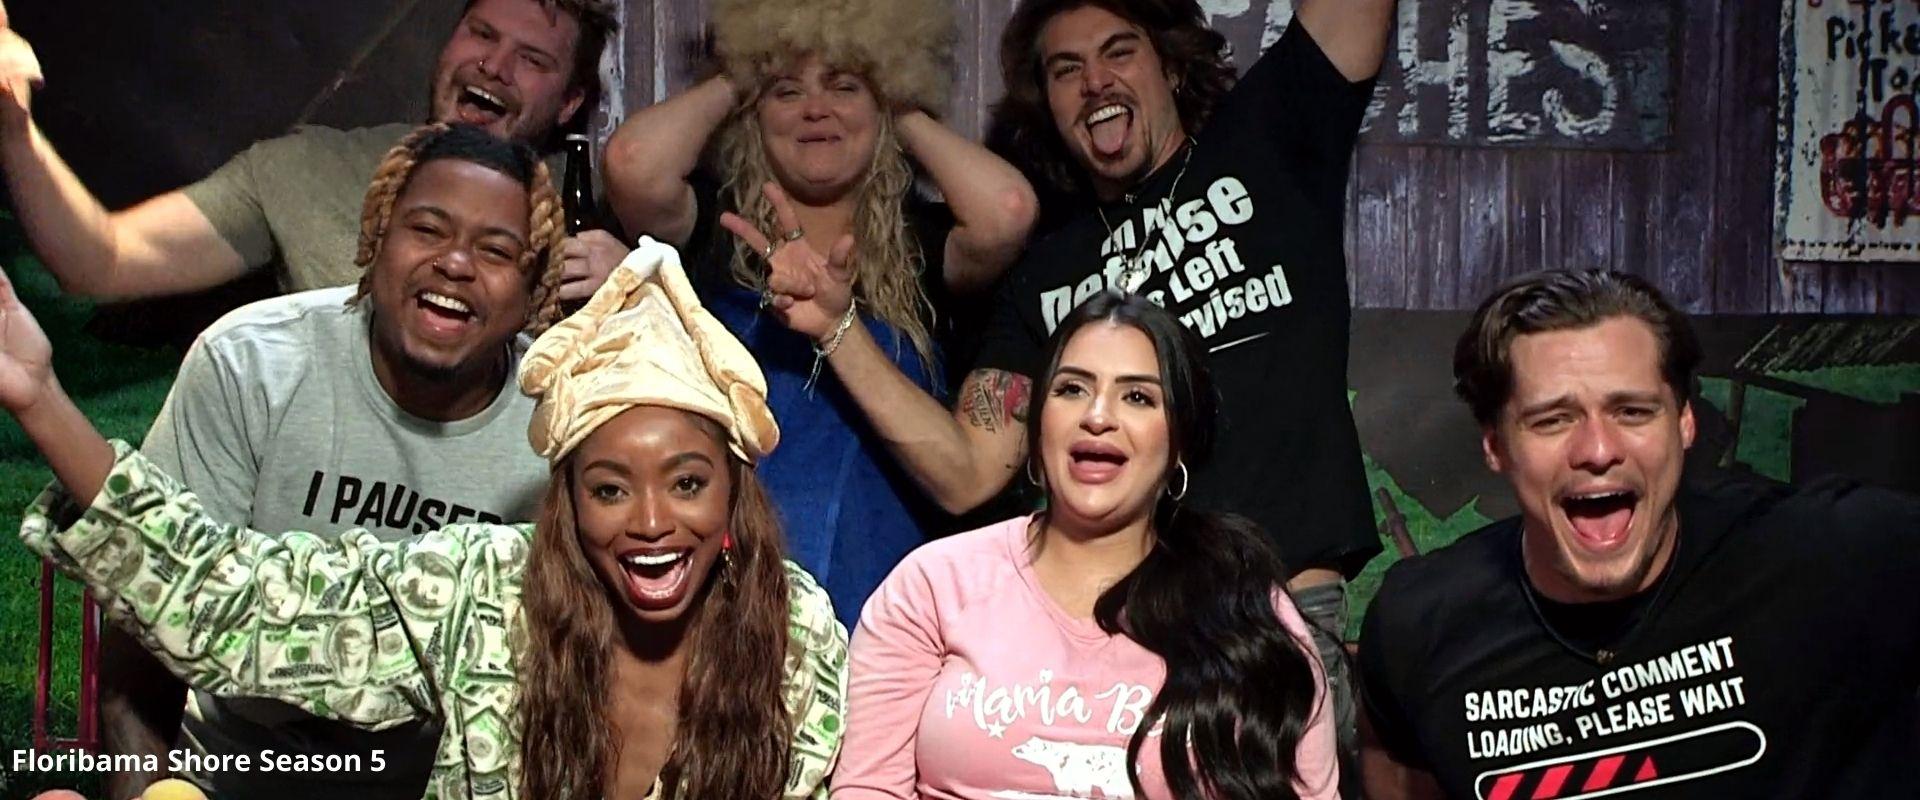 Floribama Shore Season 5 Episode 2